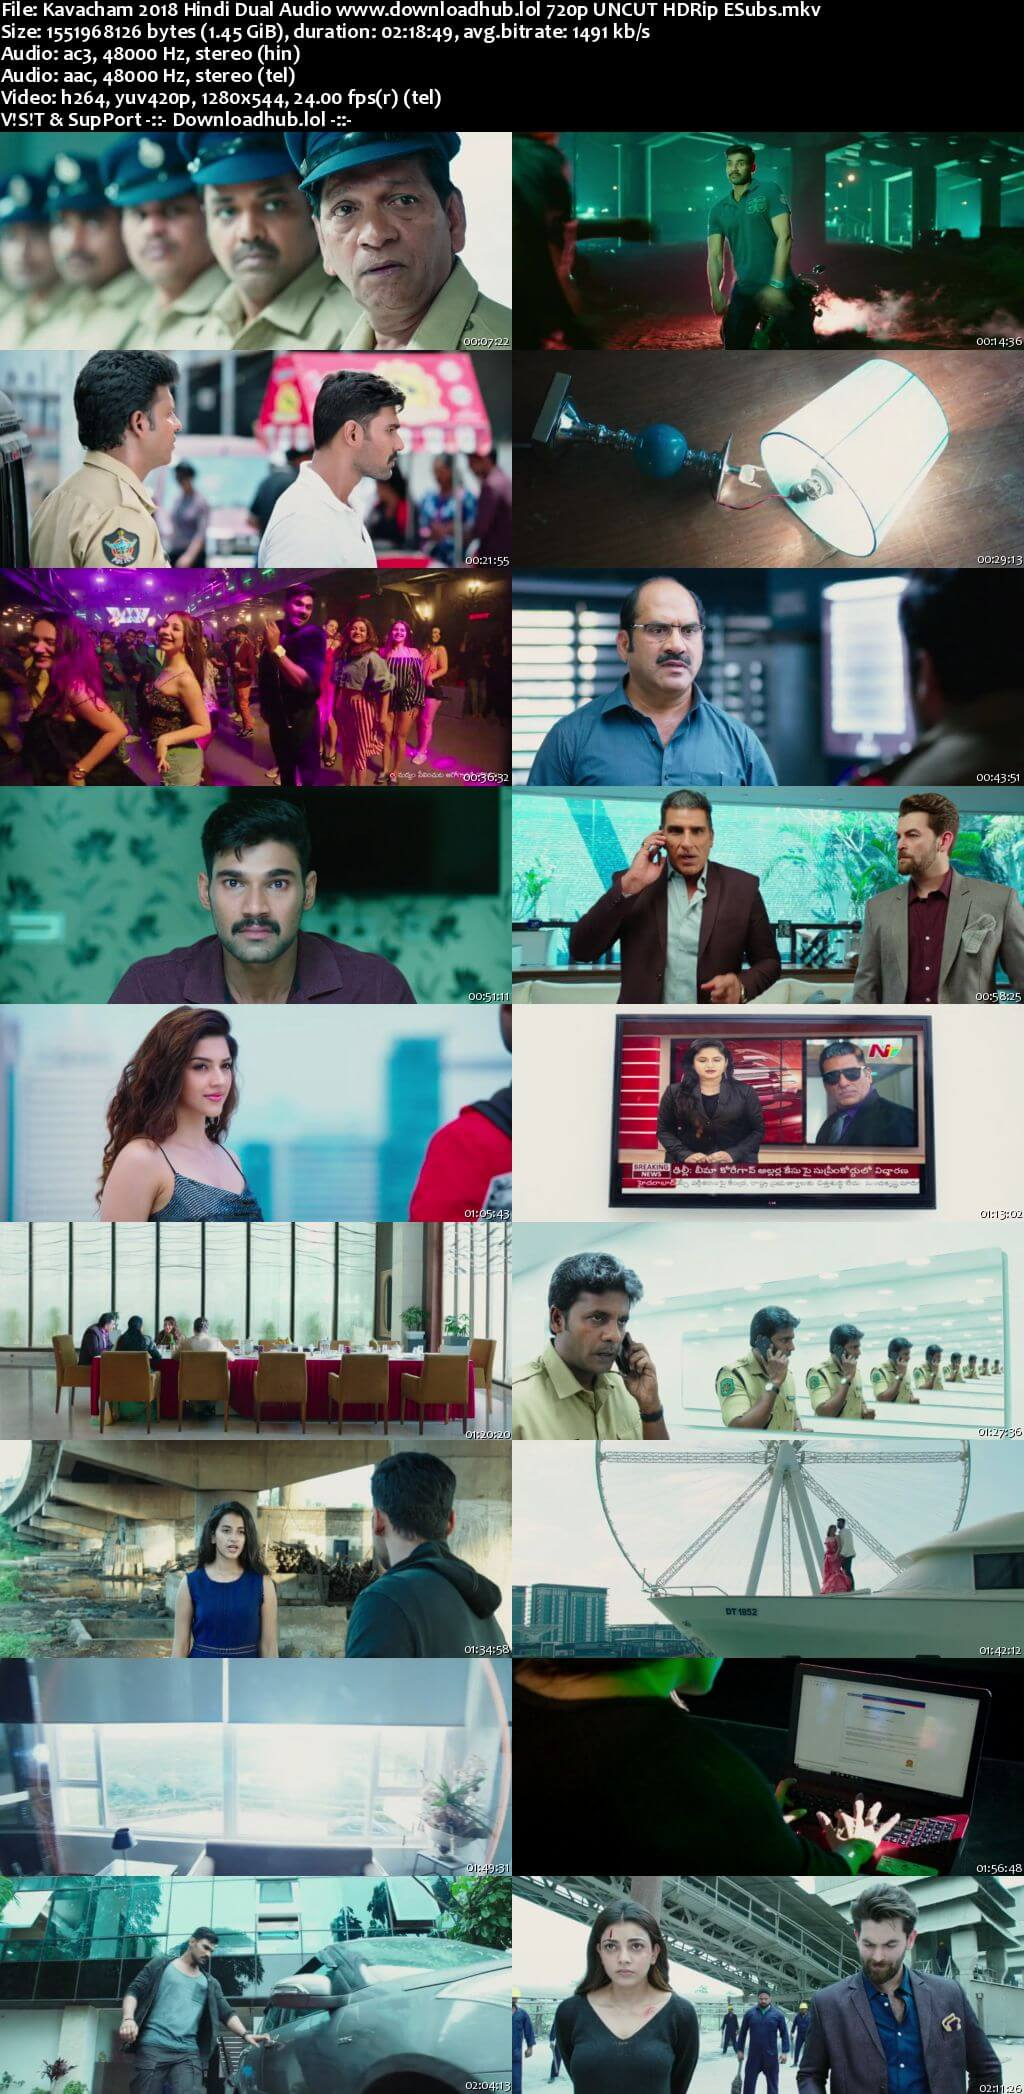 Kavacham 2018 Hindi Dual Audio 720p UNCUT HDRip ESubs